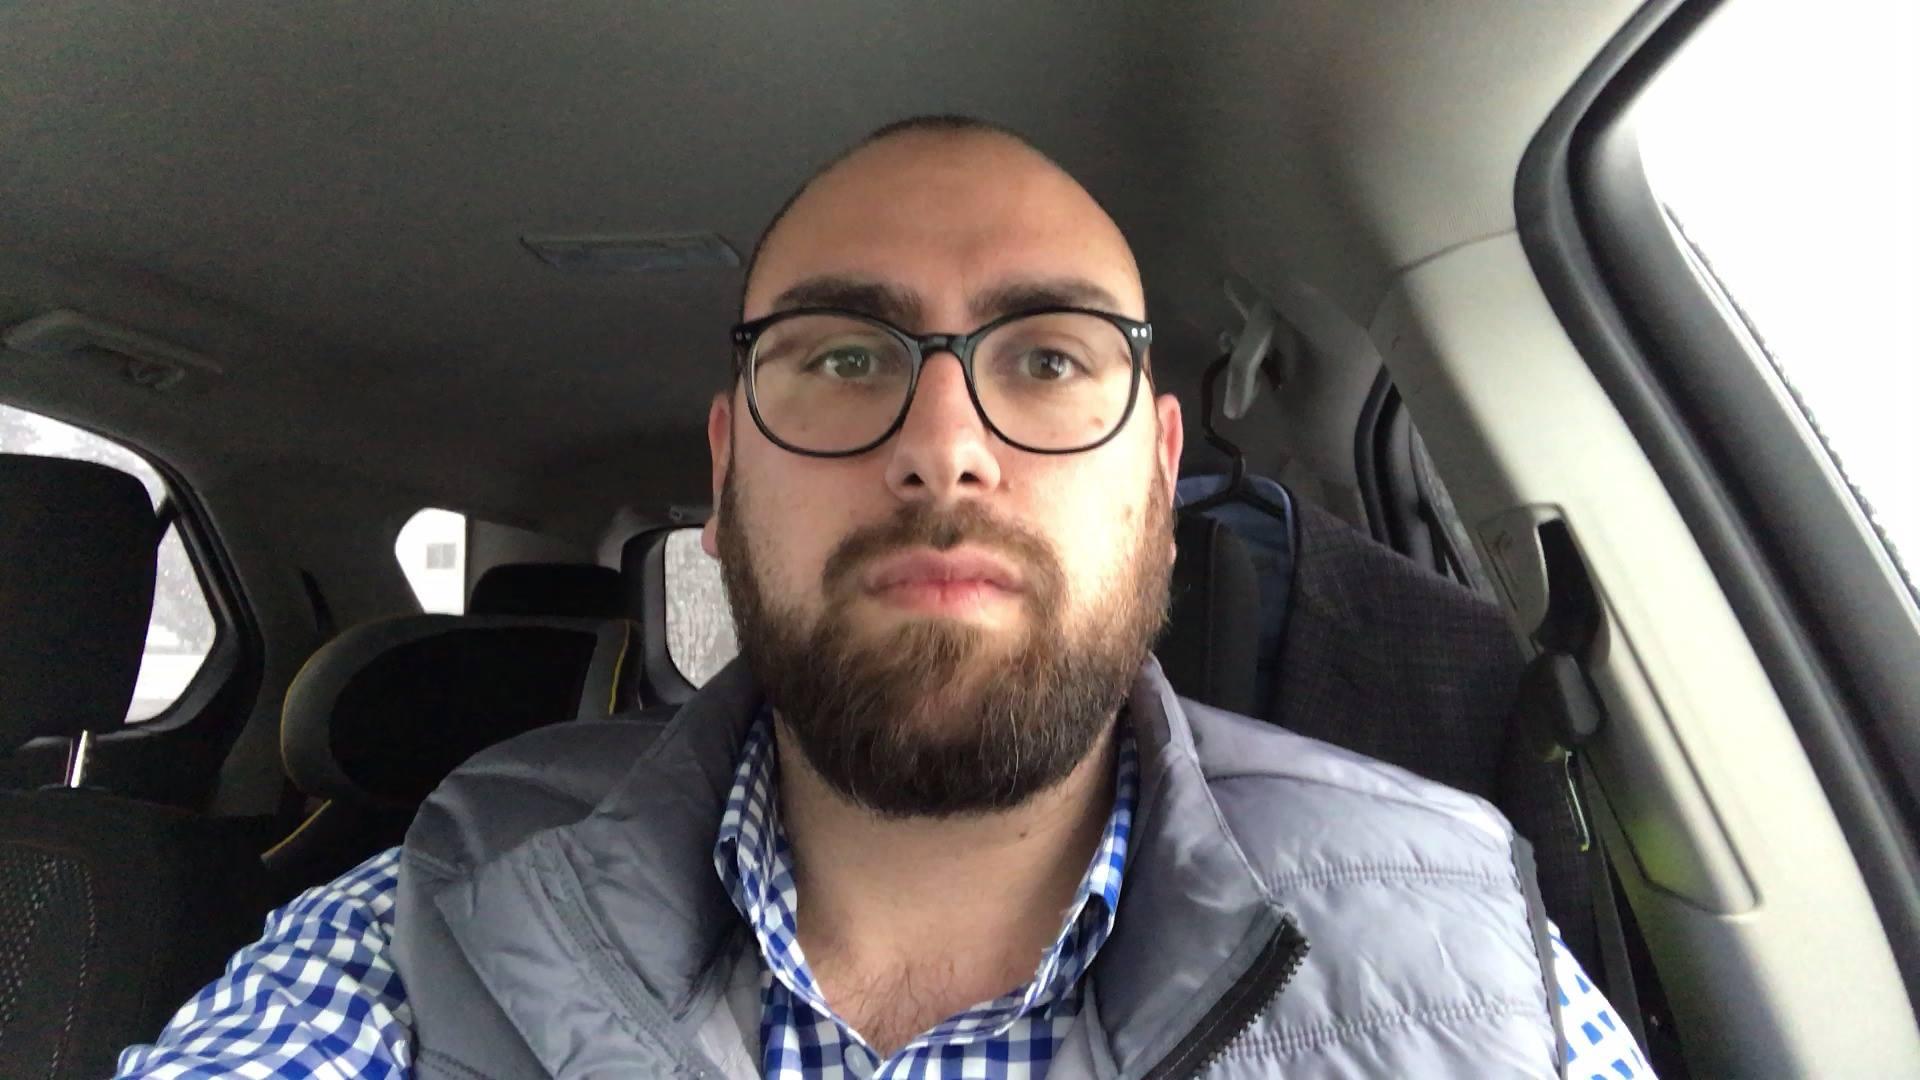 Benji shares his ChabaD story